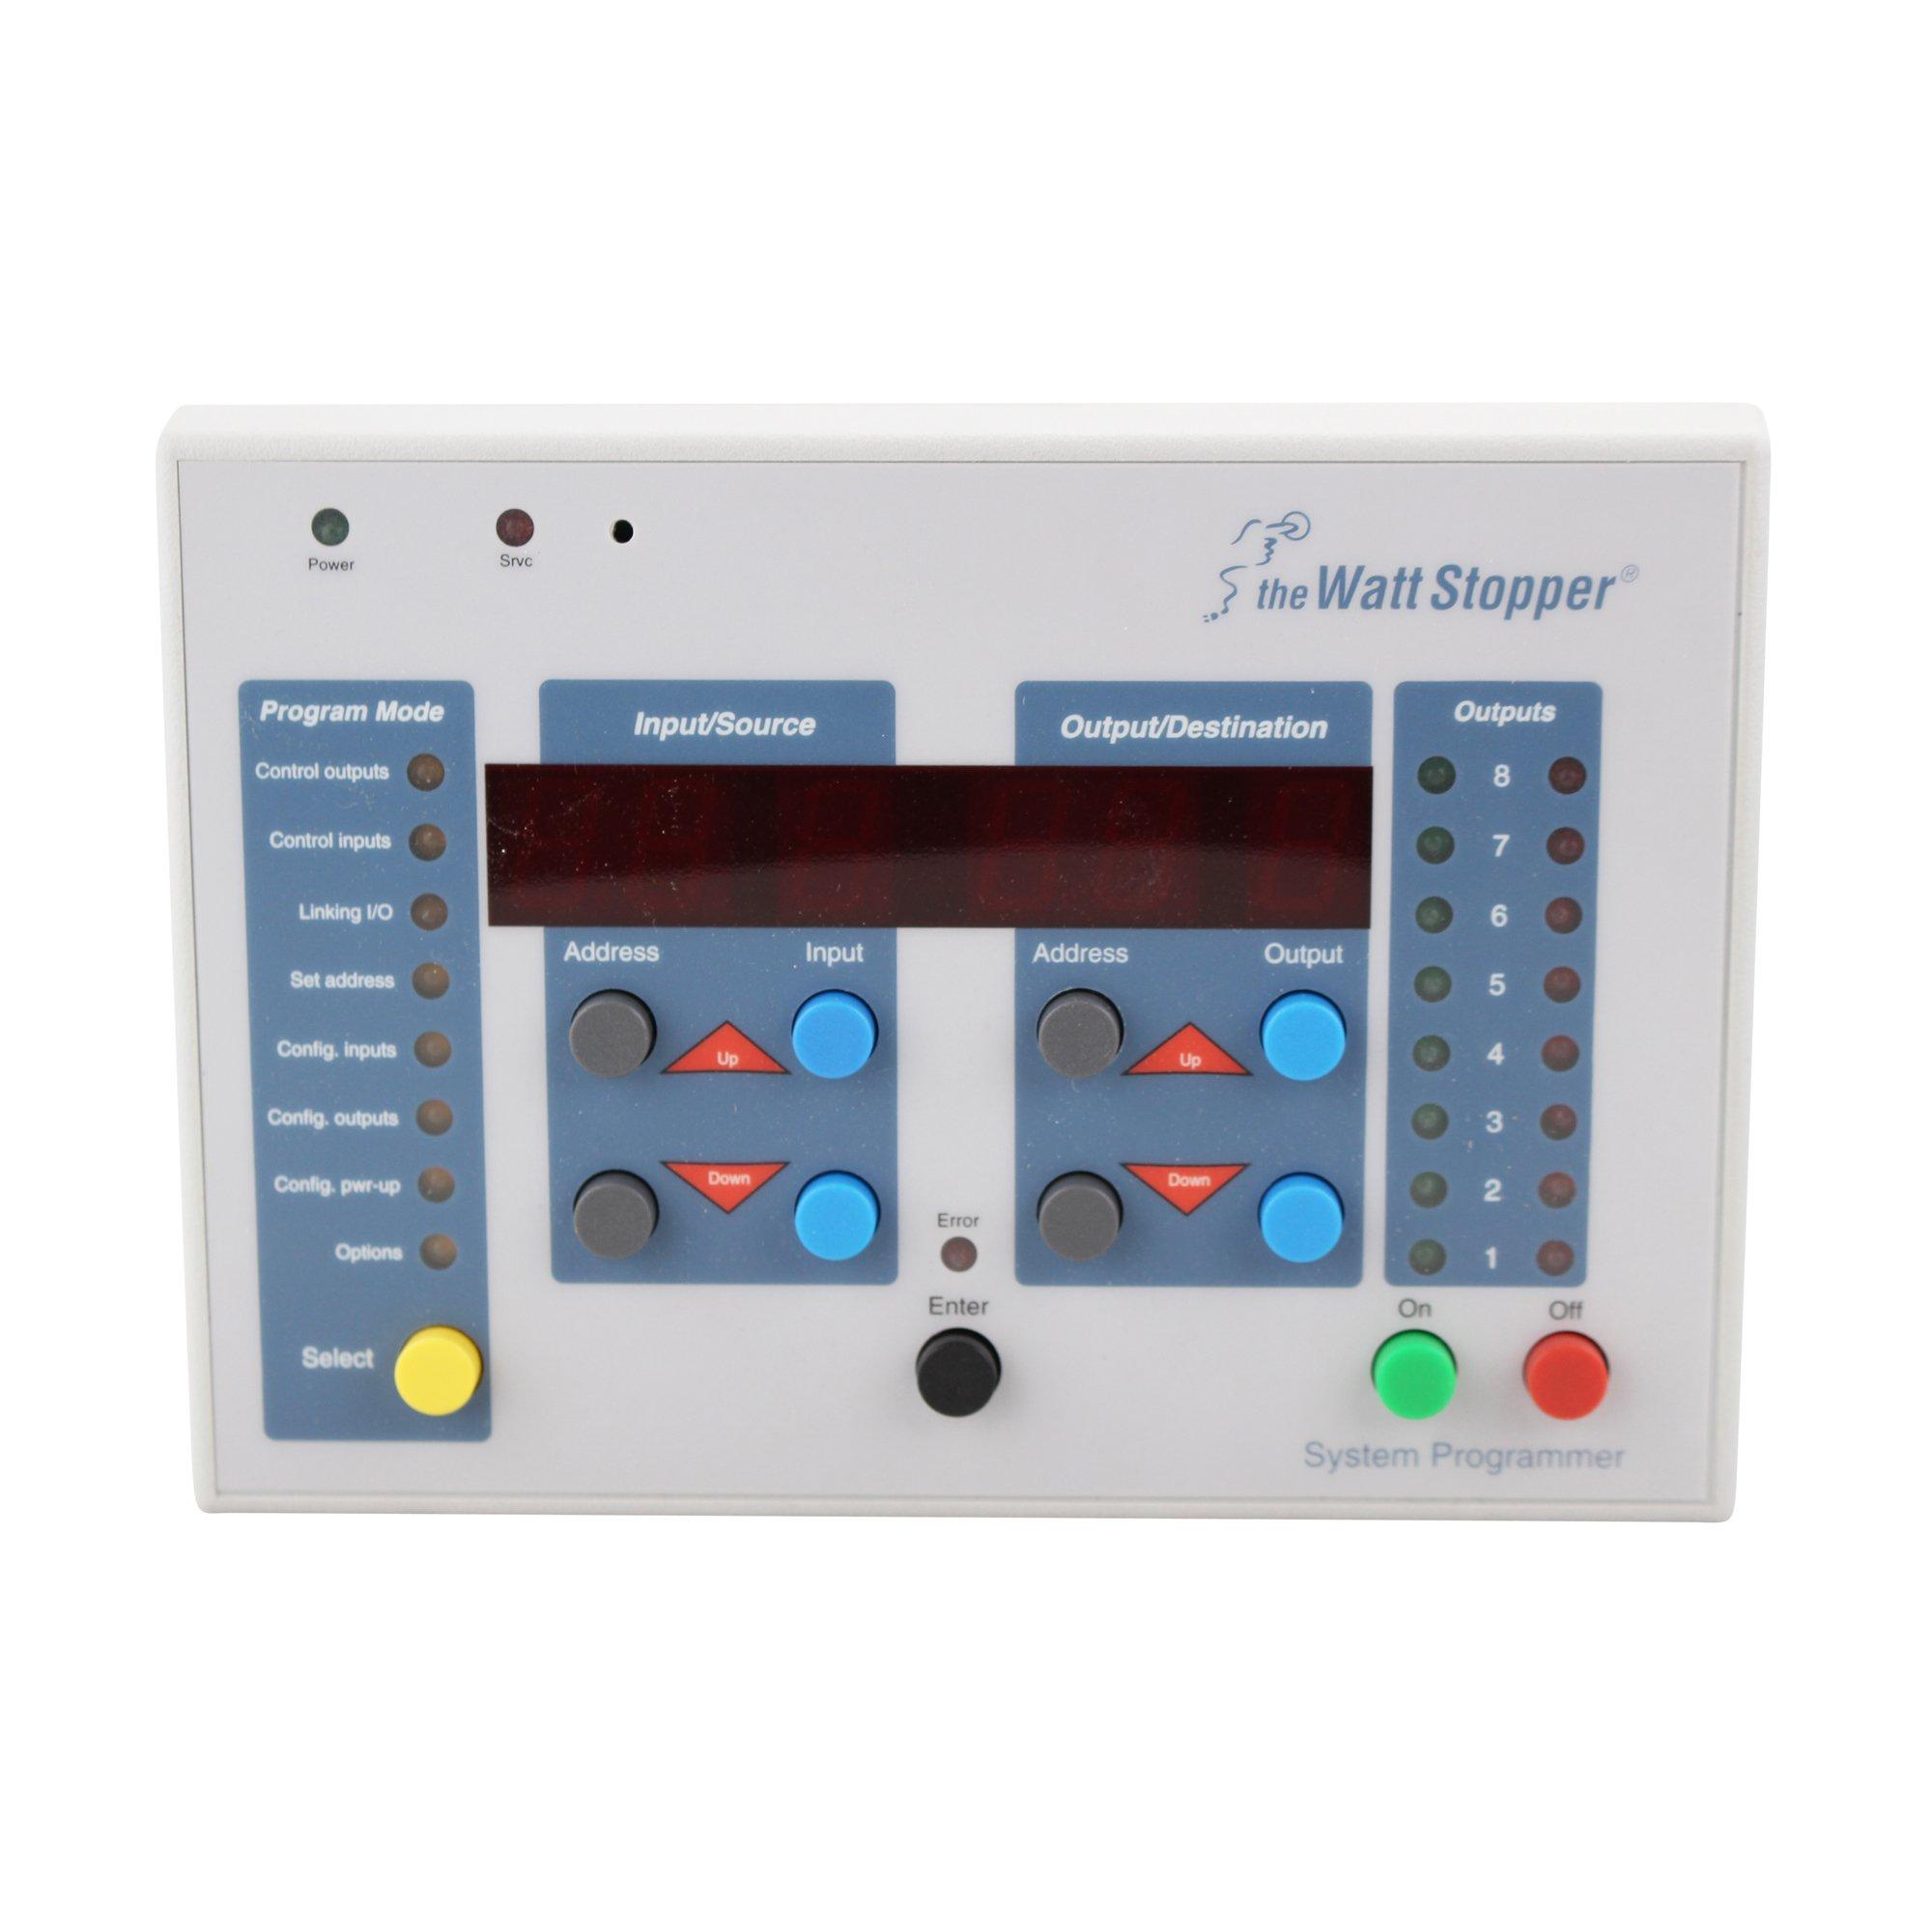 Watt Stopper SP-1 Legacy Lighting Control System Programmer, 24V